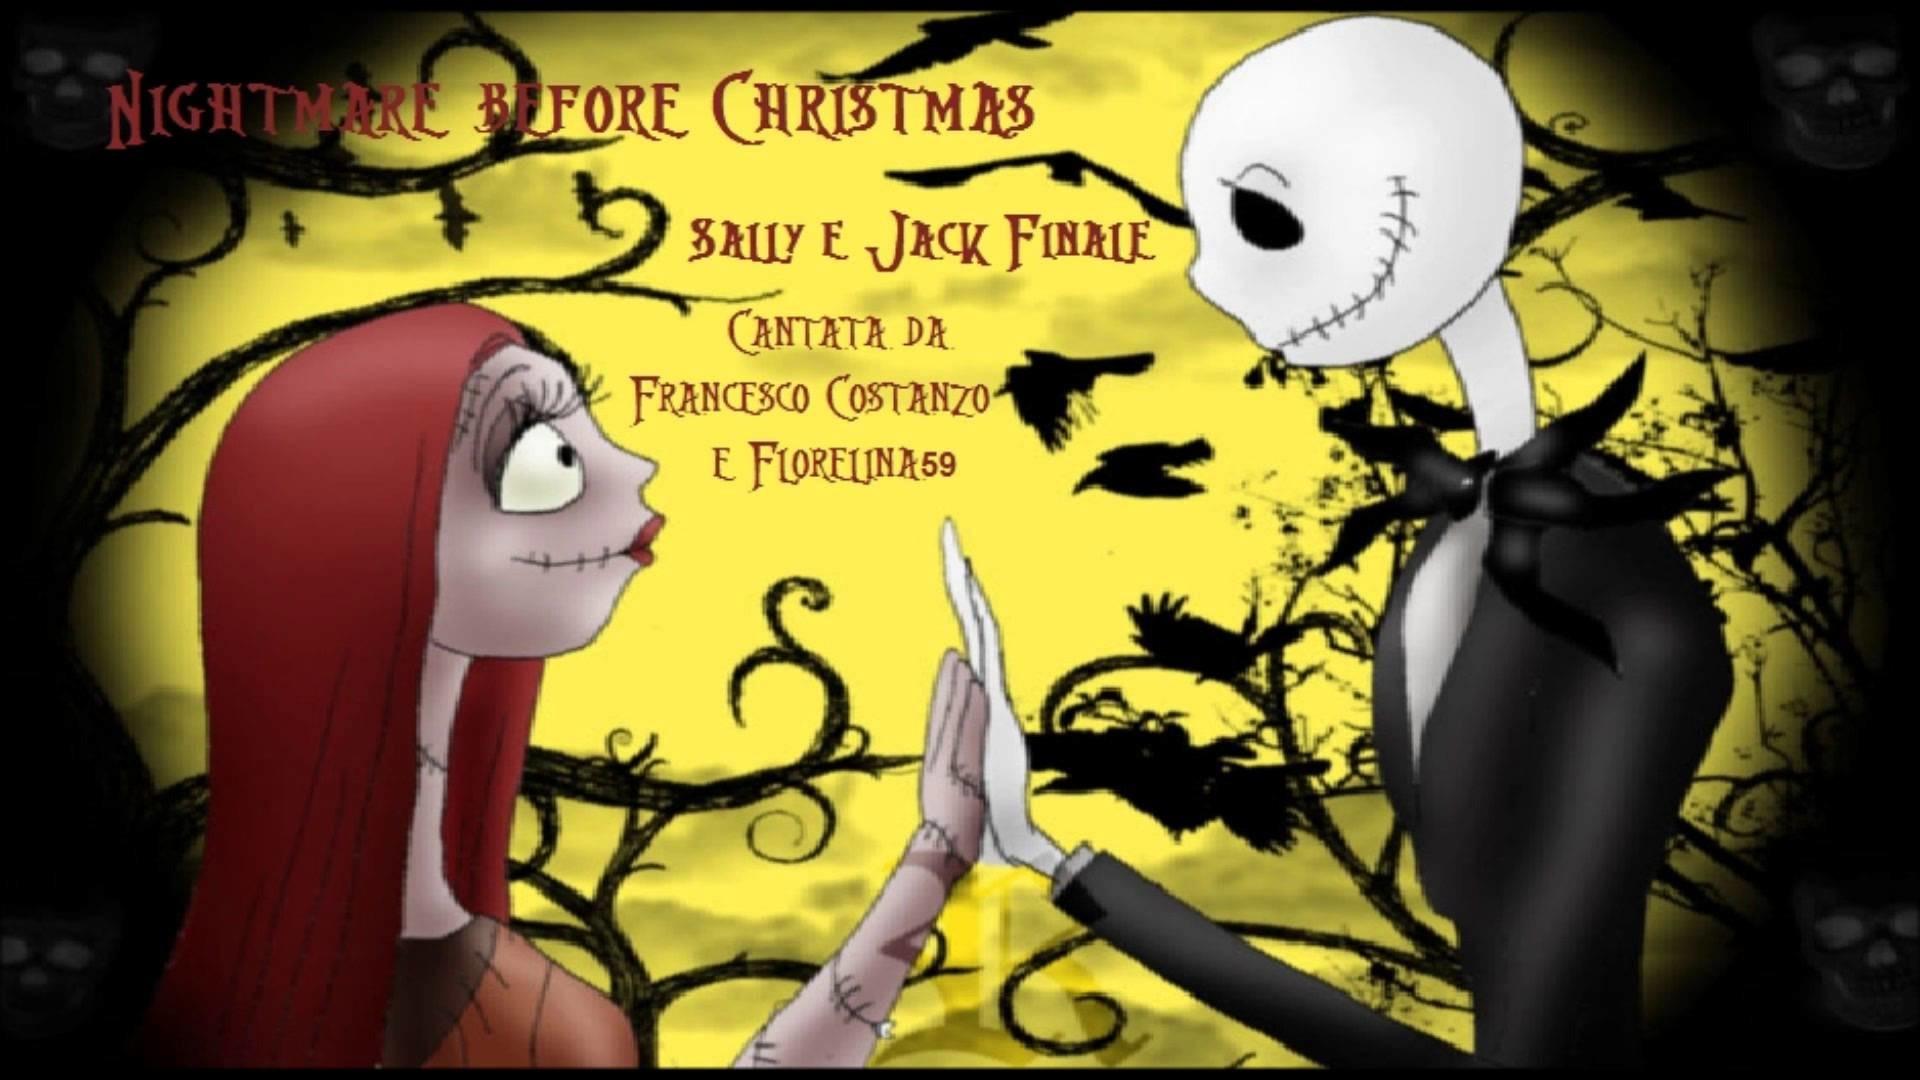 Nightmare before Christmas) Sally e Jack finale (Duetto con .